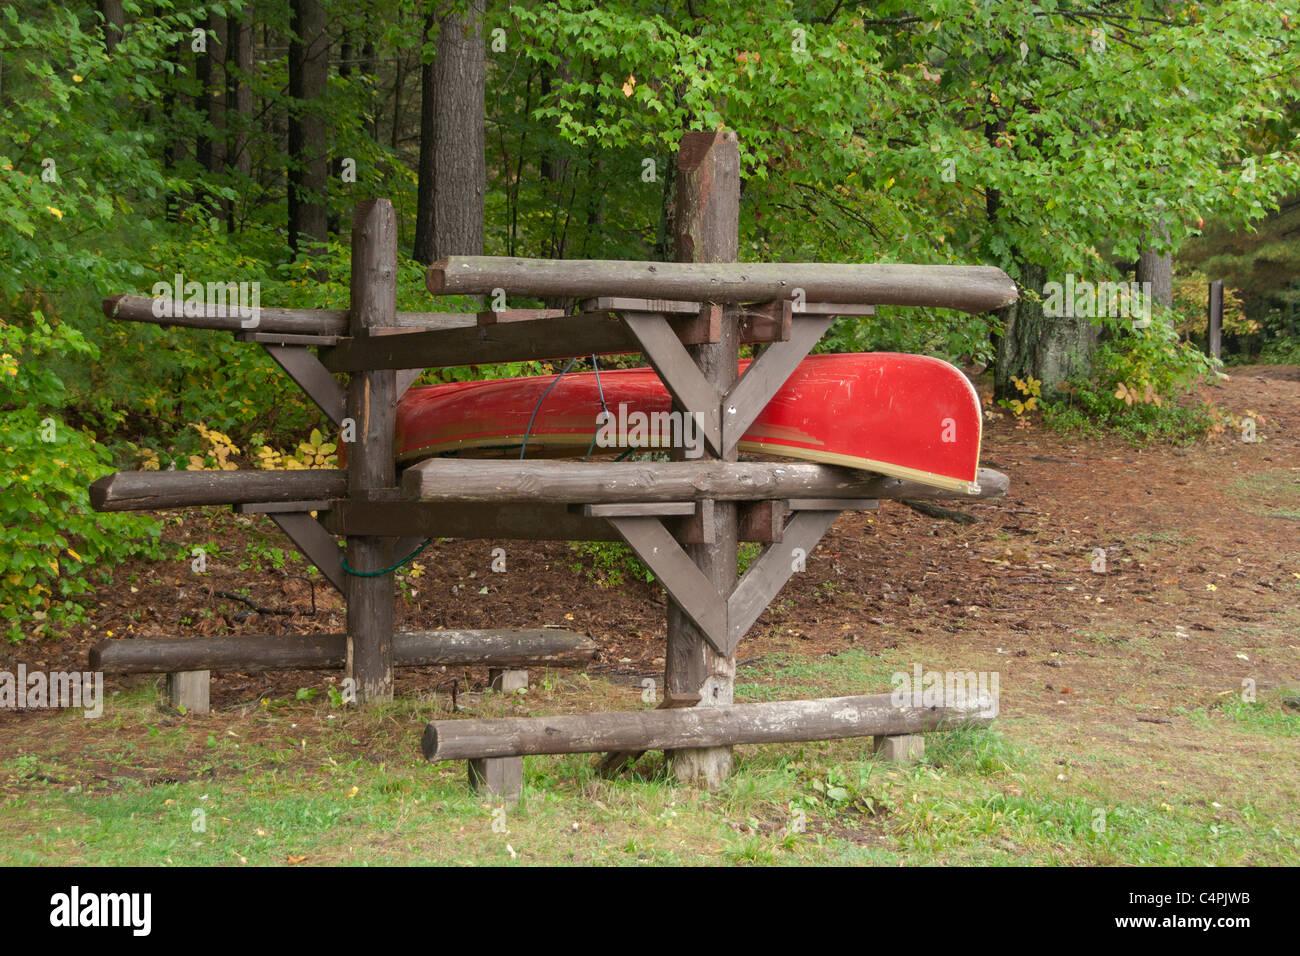 High Quality Canoe In Wooden Canoe Storage Rack, Bon Echo Provincial Park, Ontario,  Canada